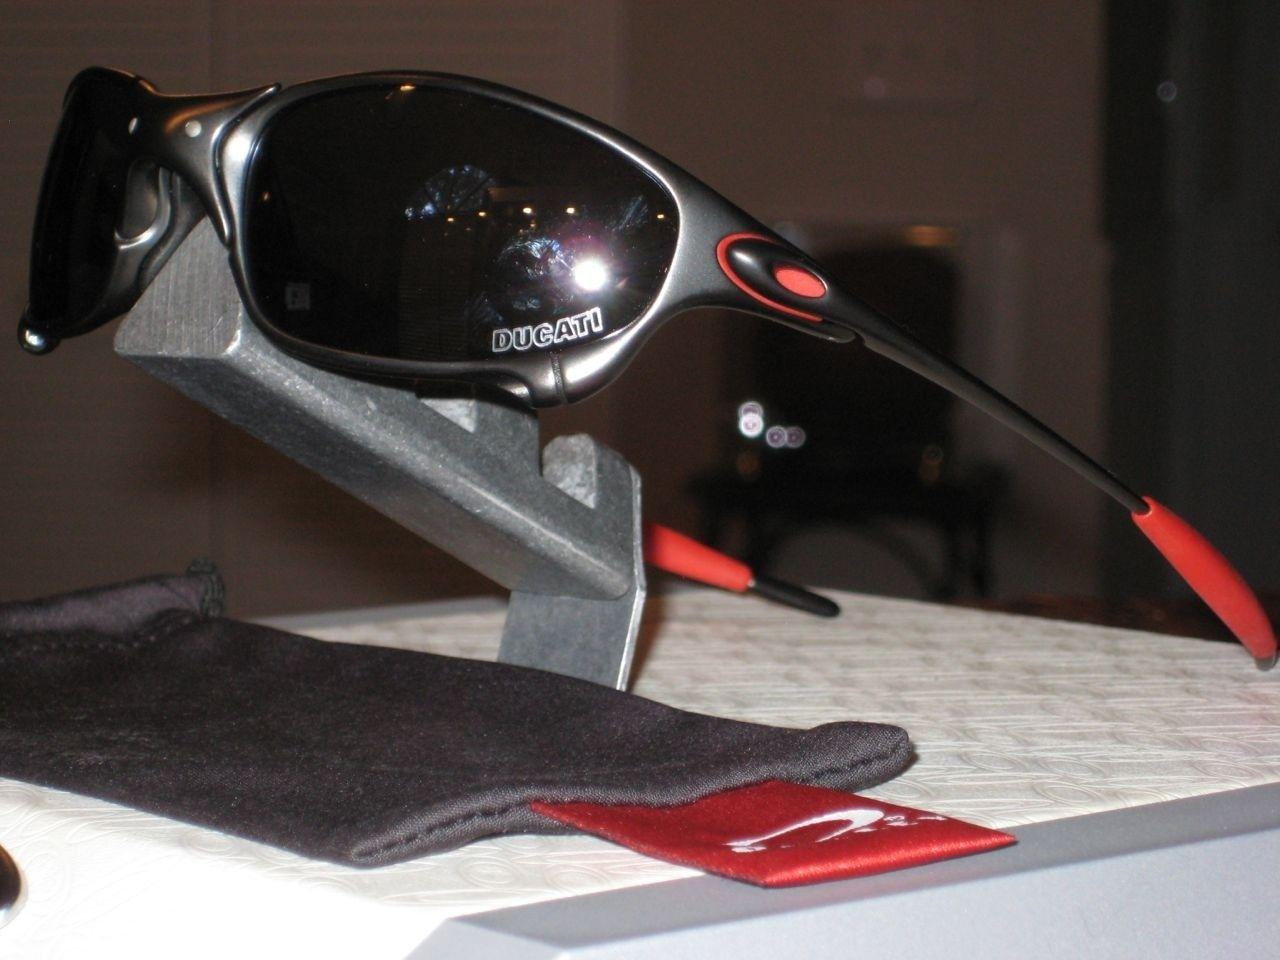 New Metals! LiveSTRONG And Ducati Juliets - oak80.jpg